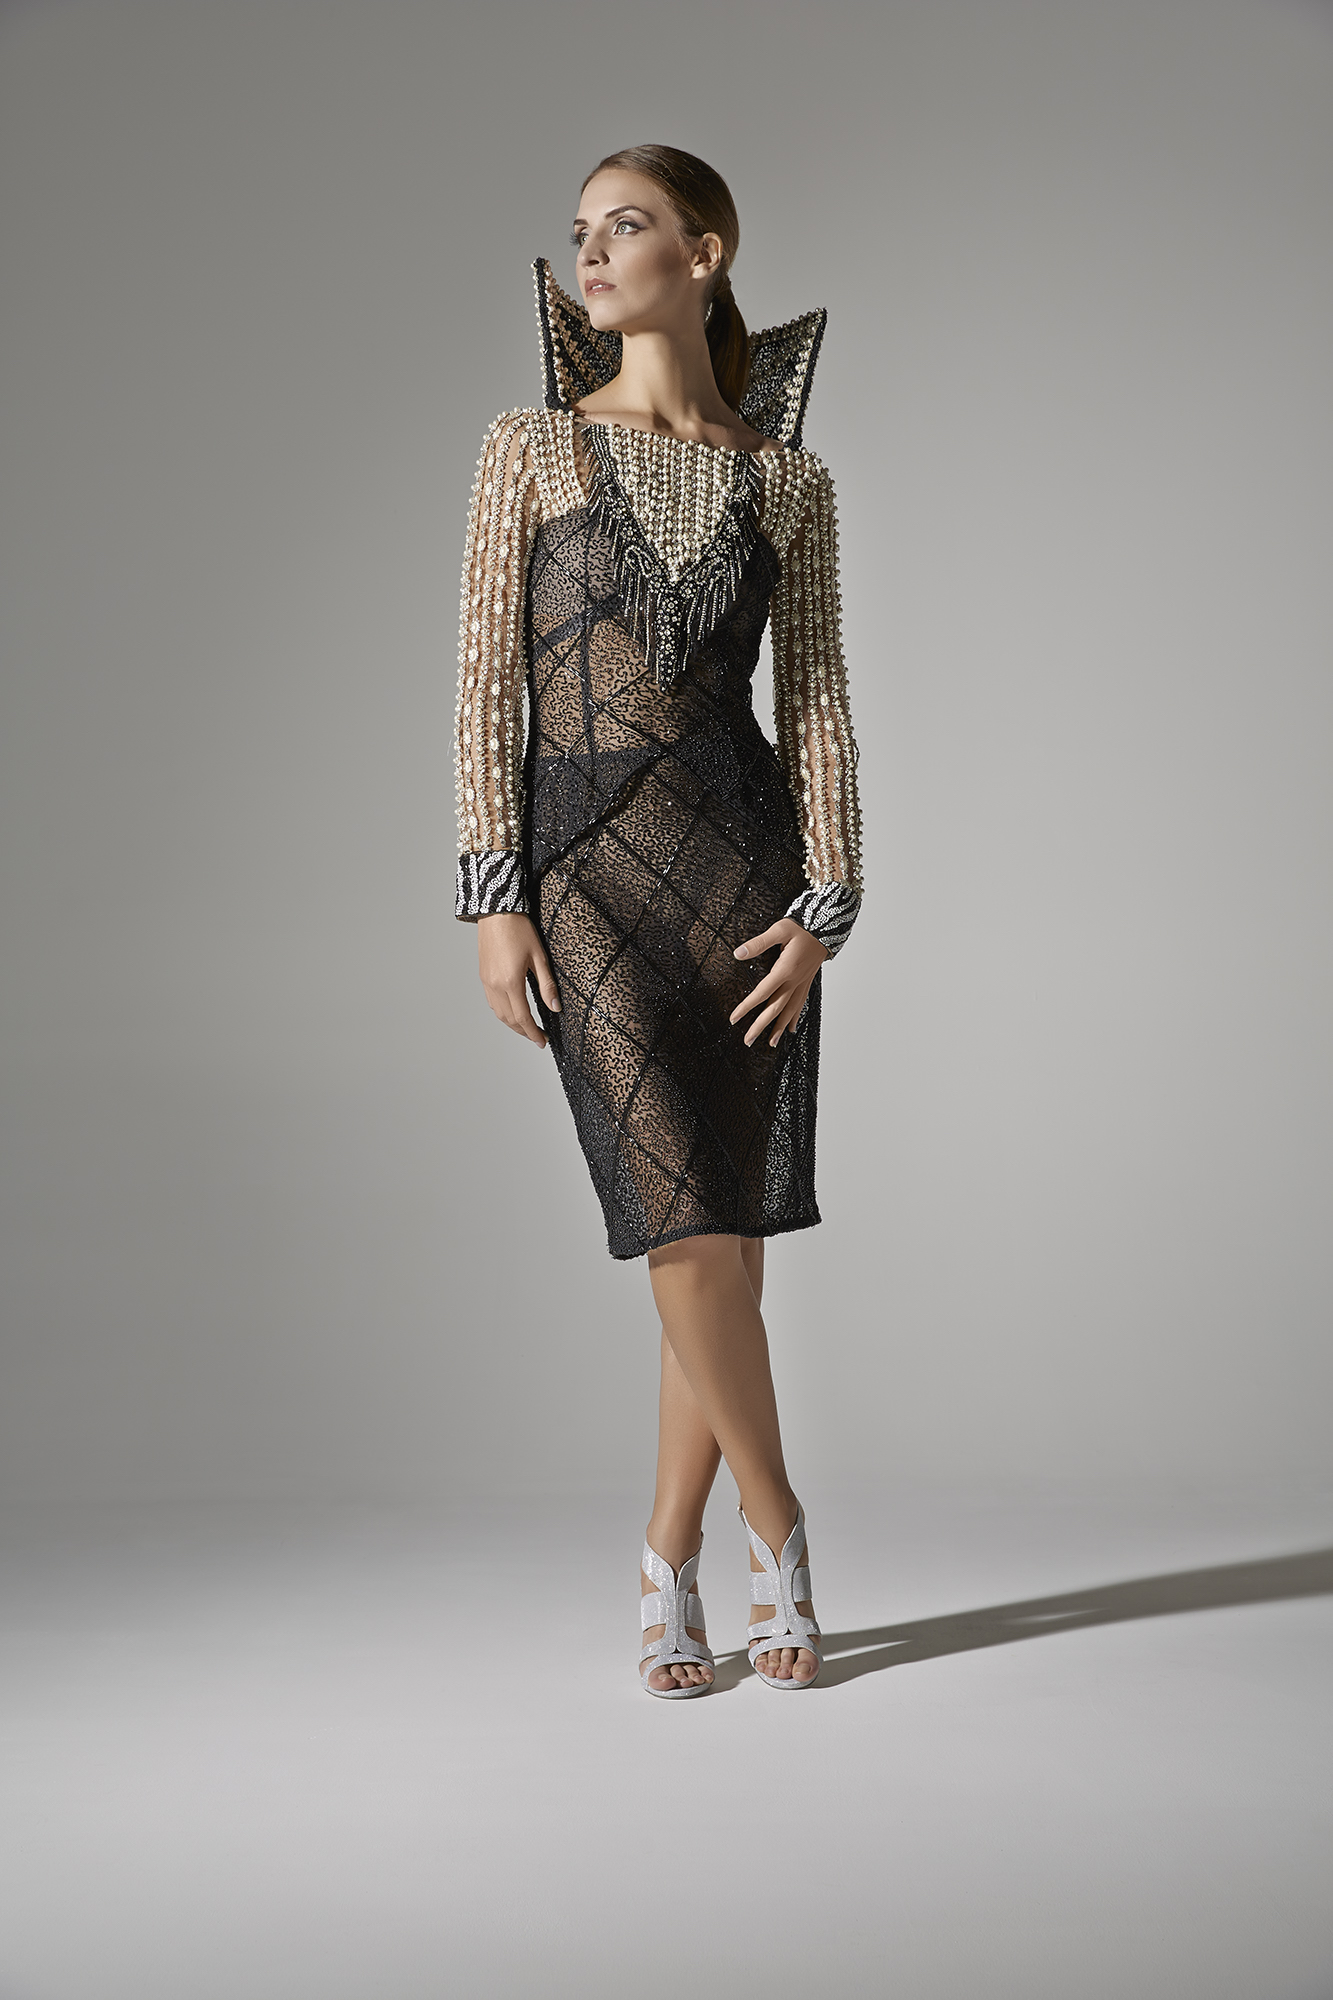 fotografo moda roma beauty fashion lumina sense art lab7